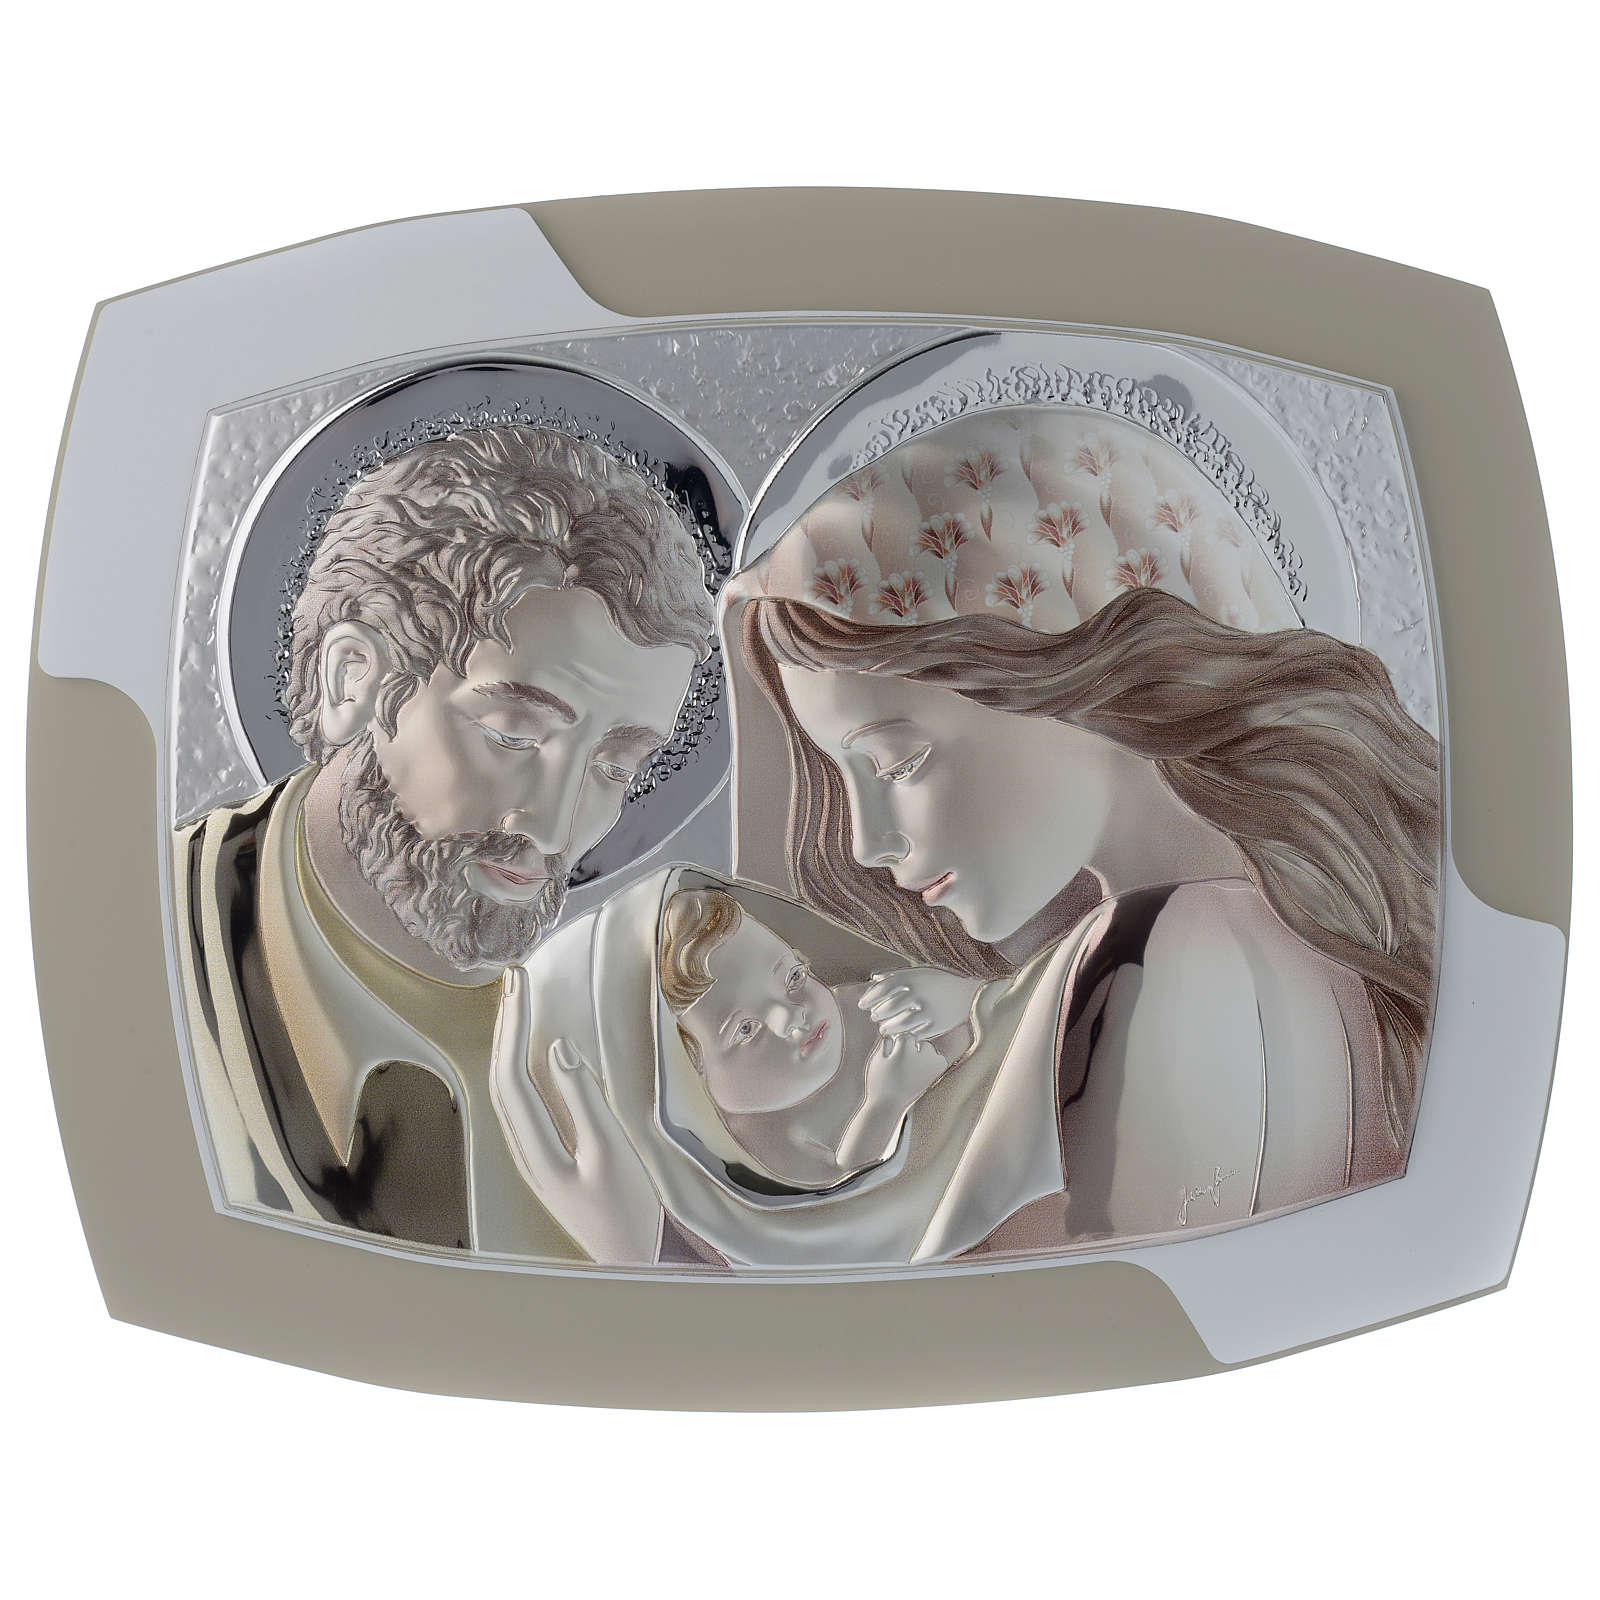 Capoletto Sacra Famiglia Argento e legno sagomato 3